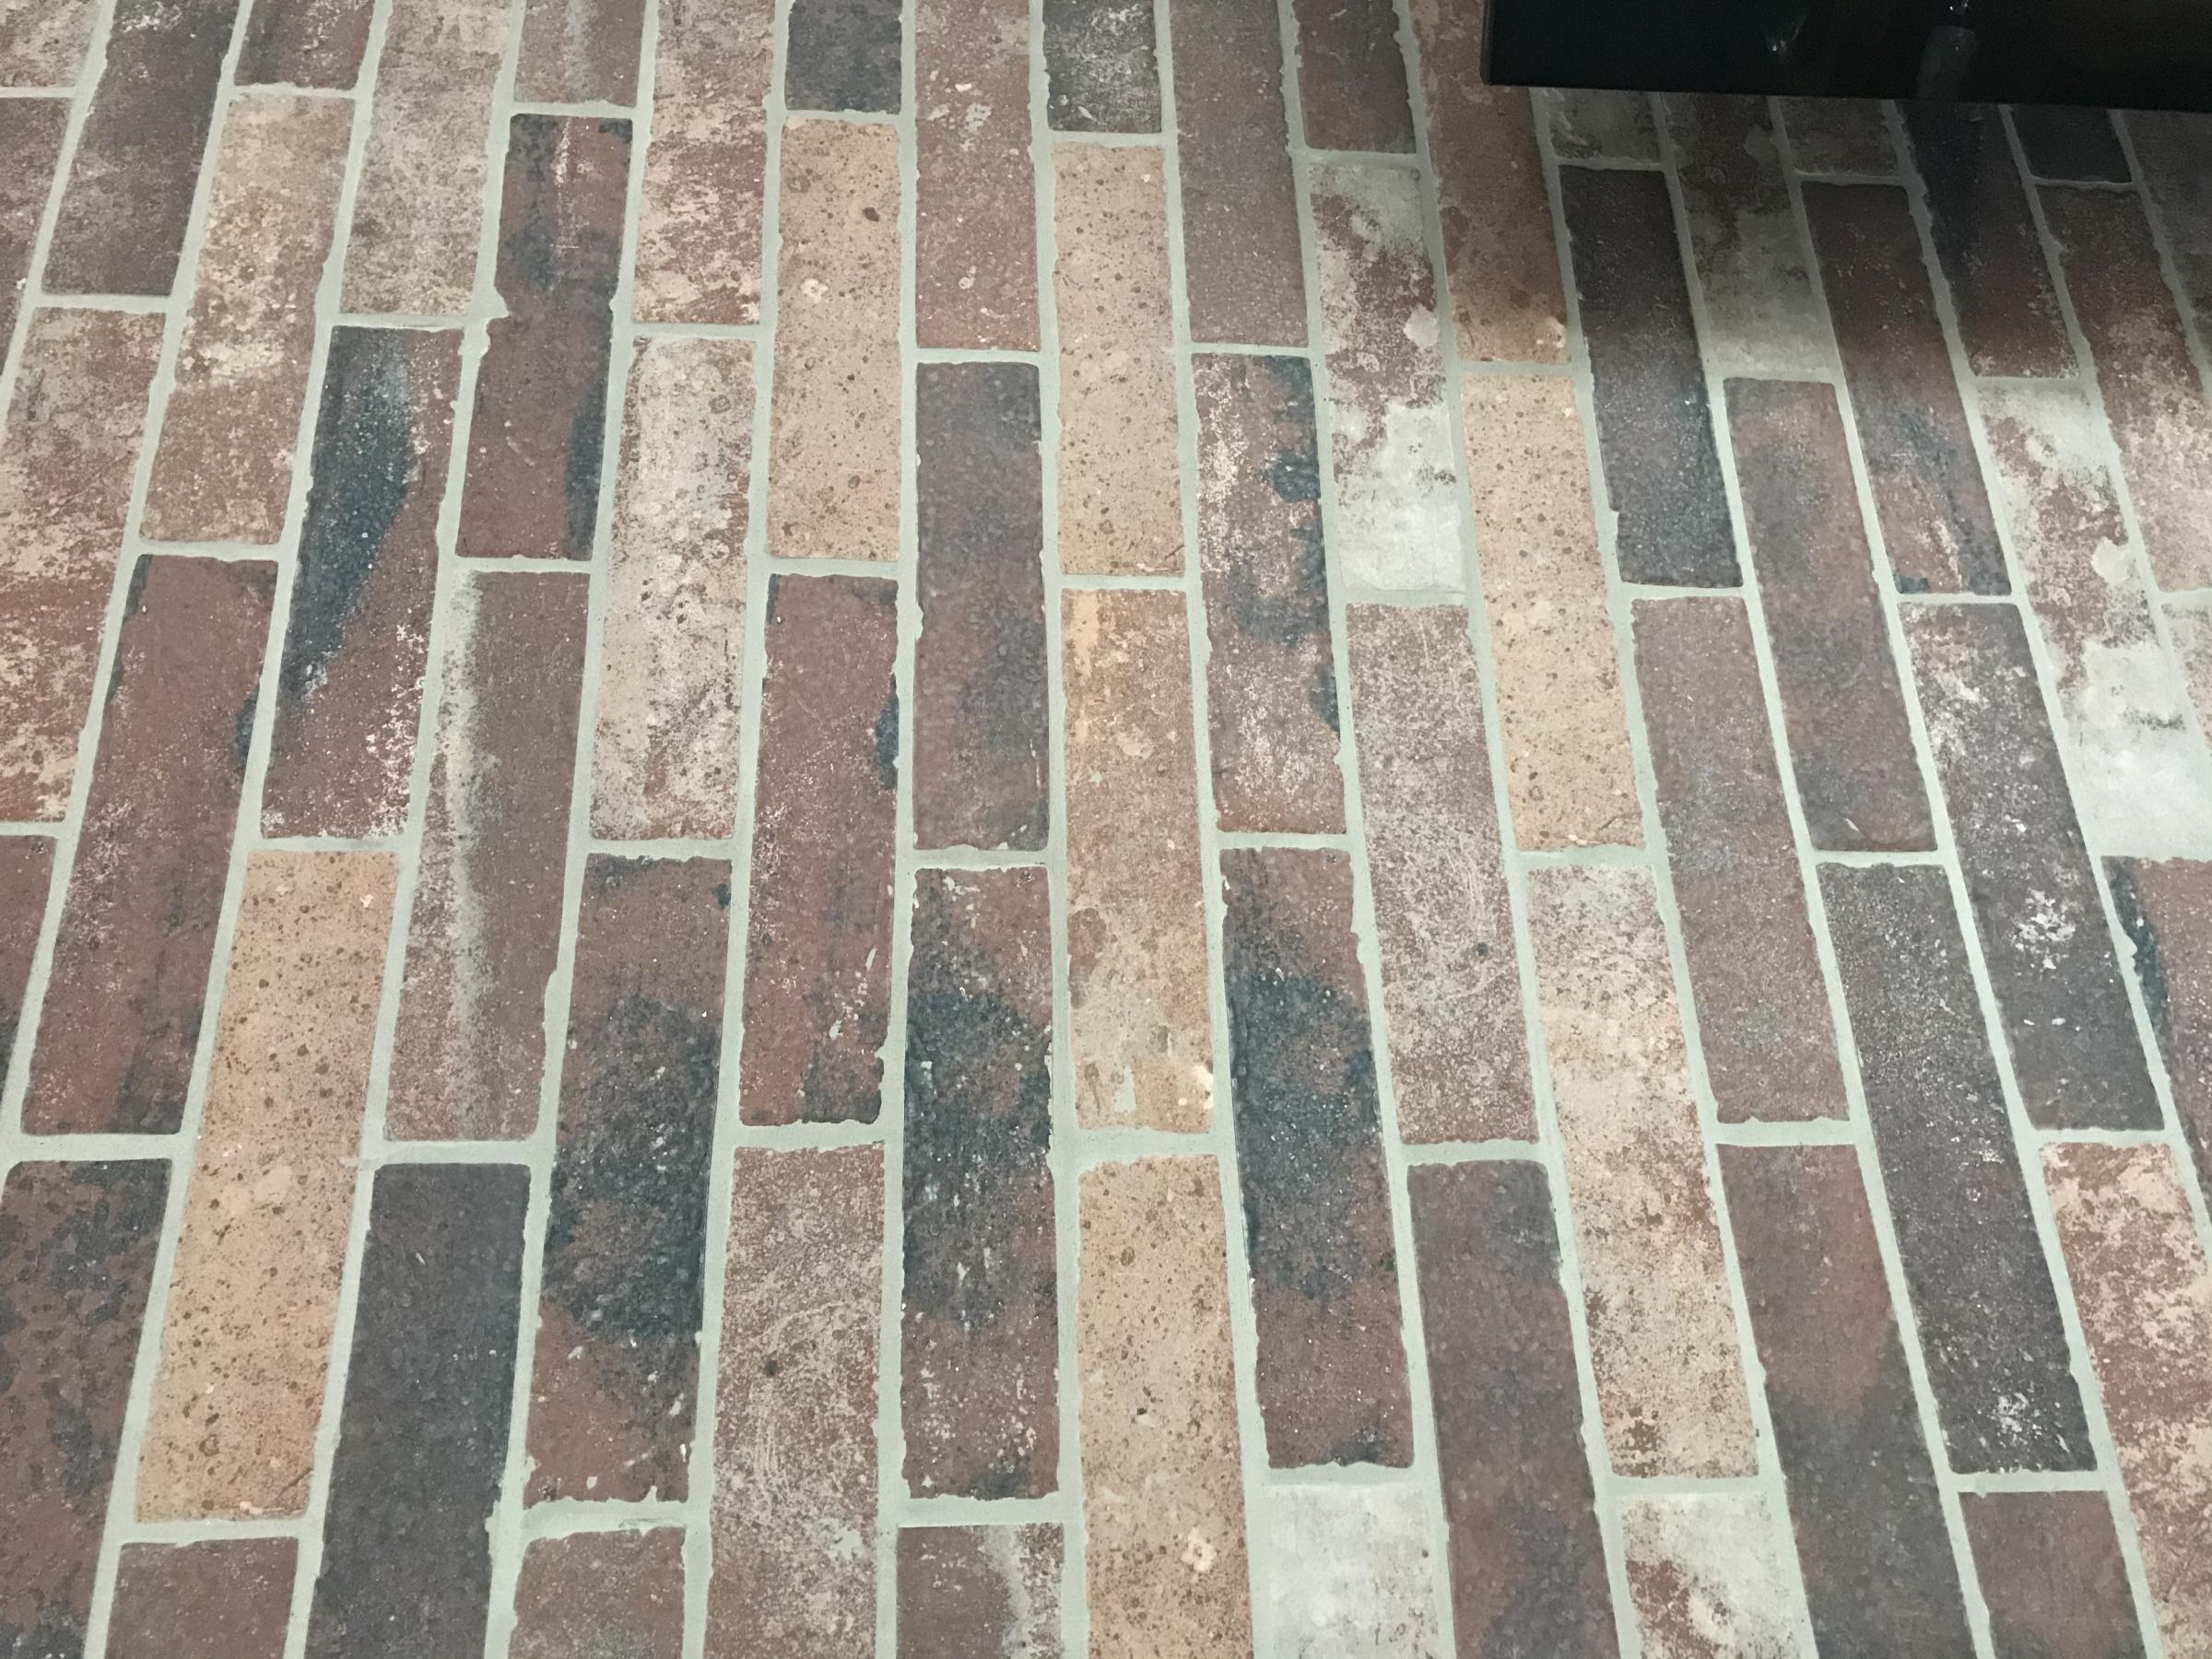 Brick tile on wall-5f4352f5-5d33-471b-a201-61ea4ef8aae1.jpg